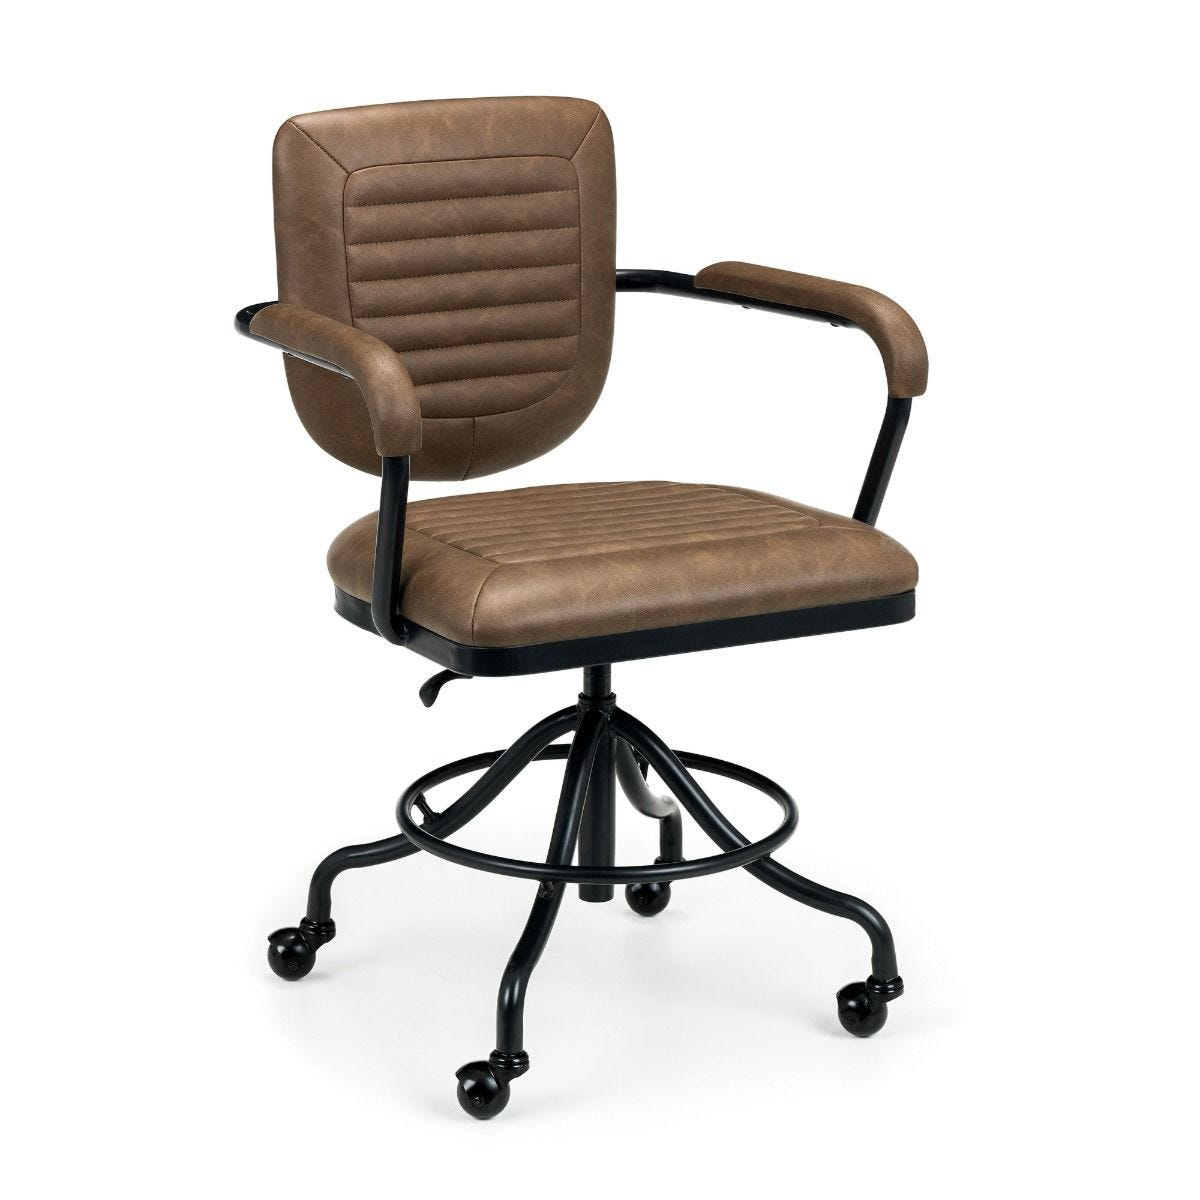 Julian Bowen Gehry Faux Leather Office Chair